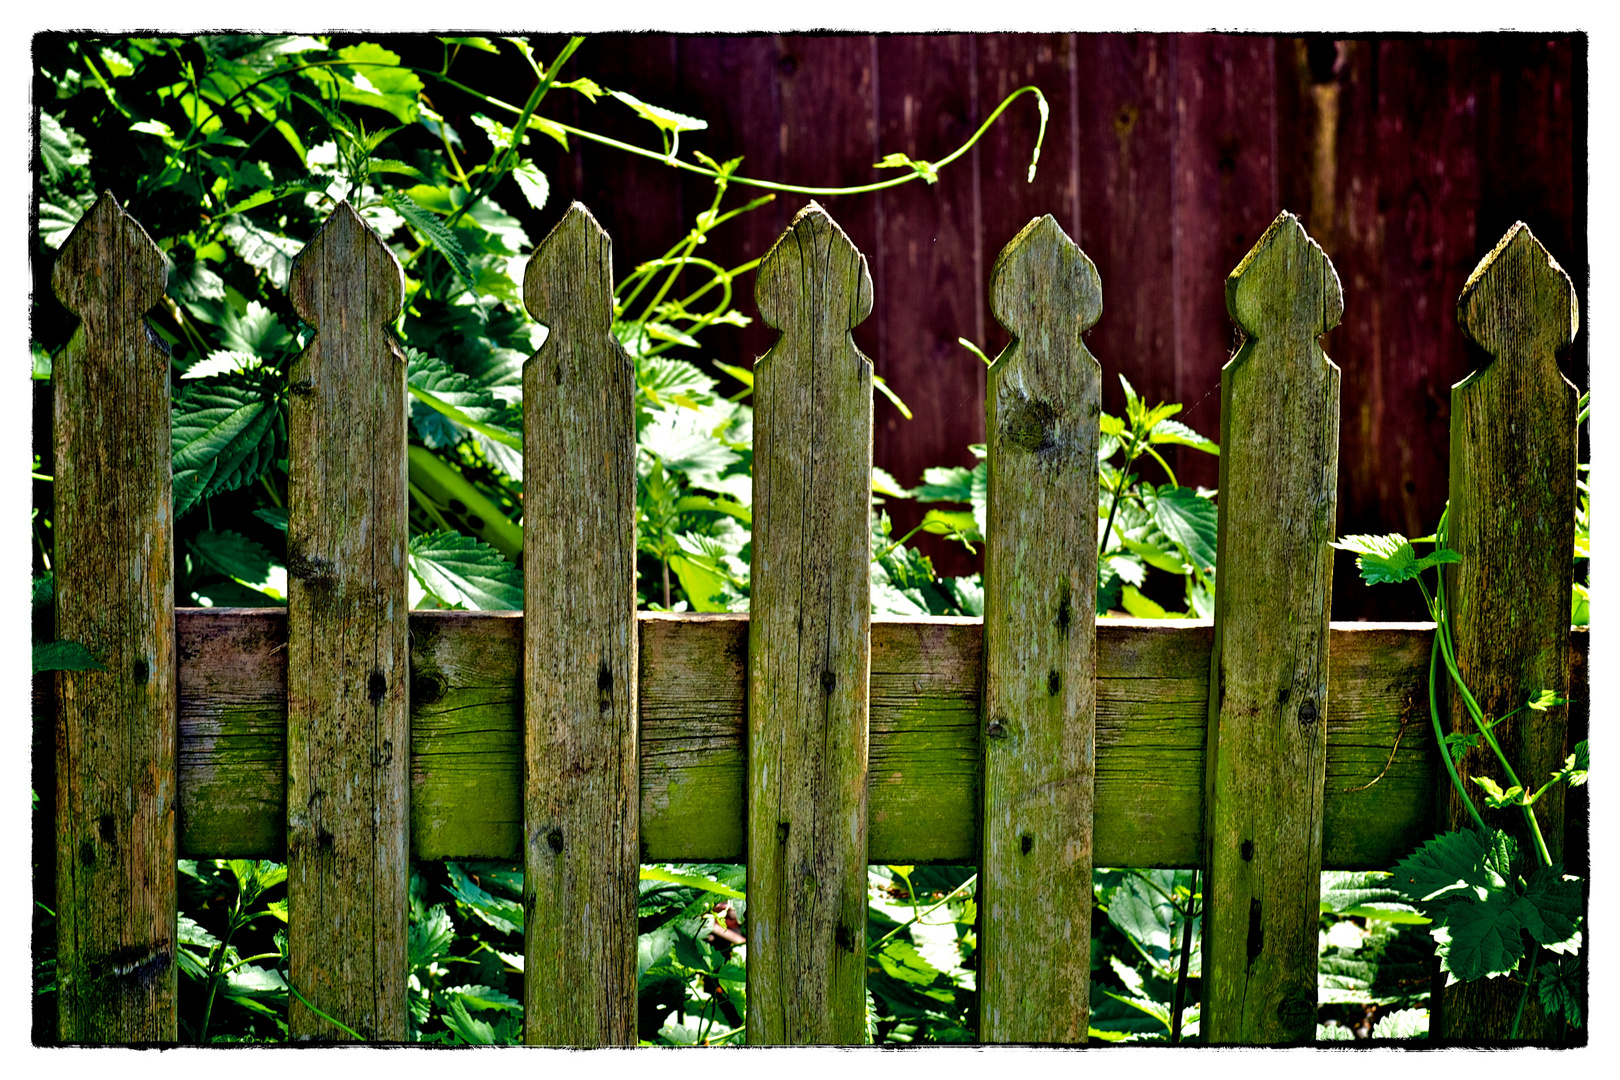 Full Size of Garten Zaun Alter Gartenzaun Foto Bild Landschaft Trampolin Ecksofa Lärmschutz Sichtschutz Holz Relaxsessel Paravent Mastleuchten Bewässerung Lärmschutzwand Garten Garten Zaun